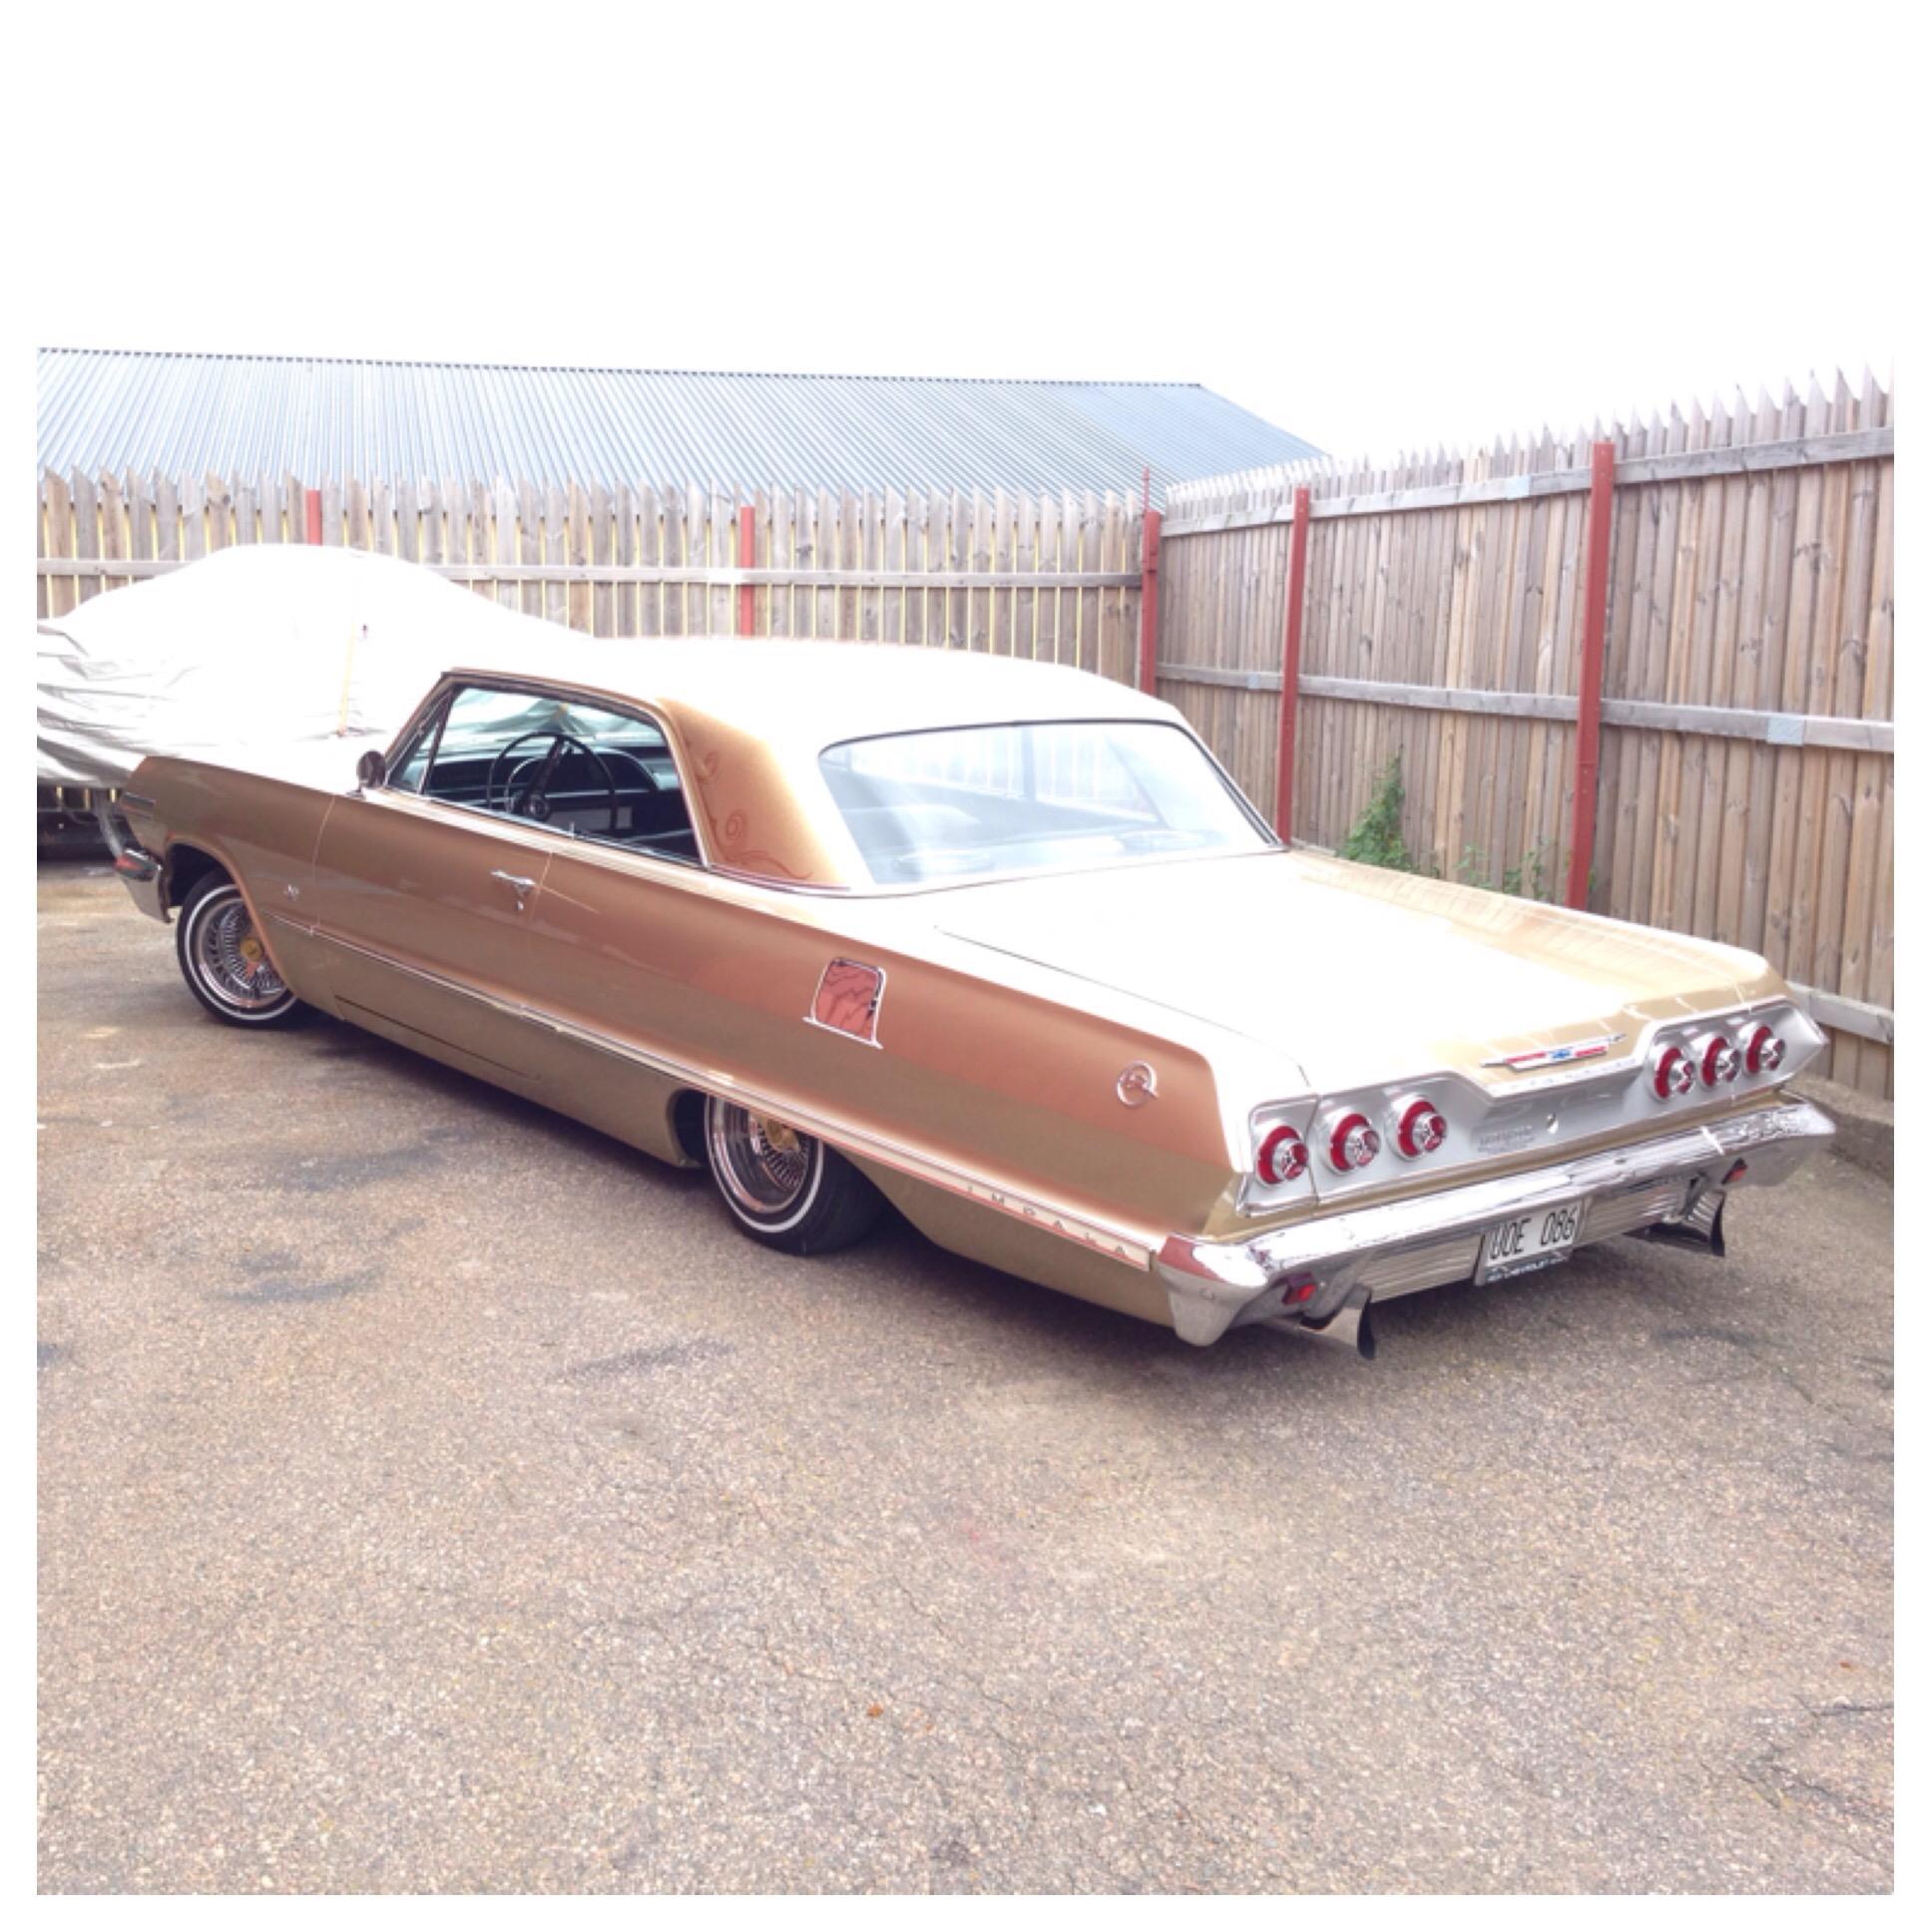 1963 Impala project